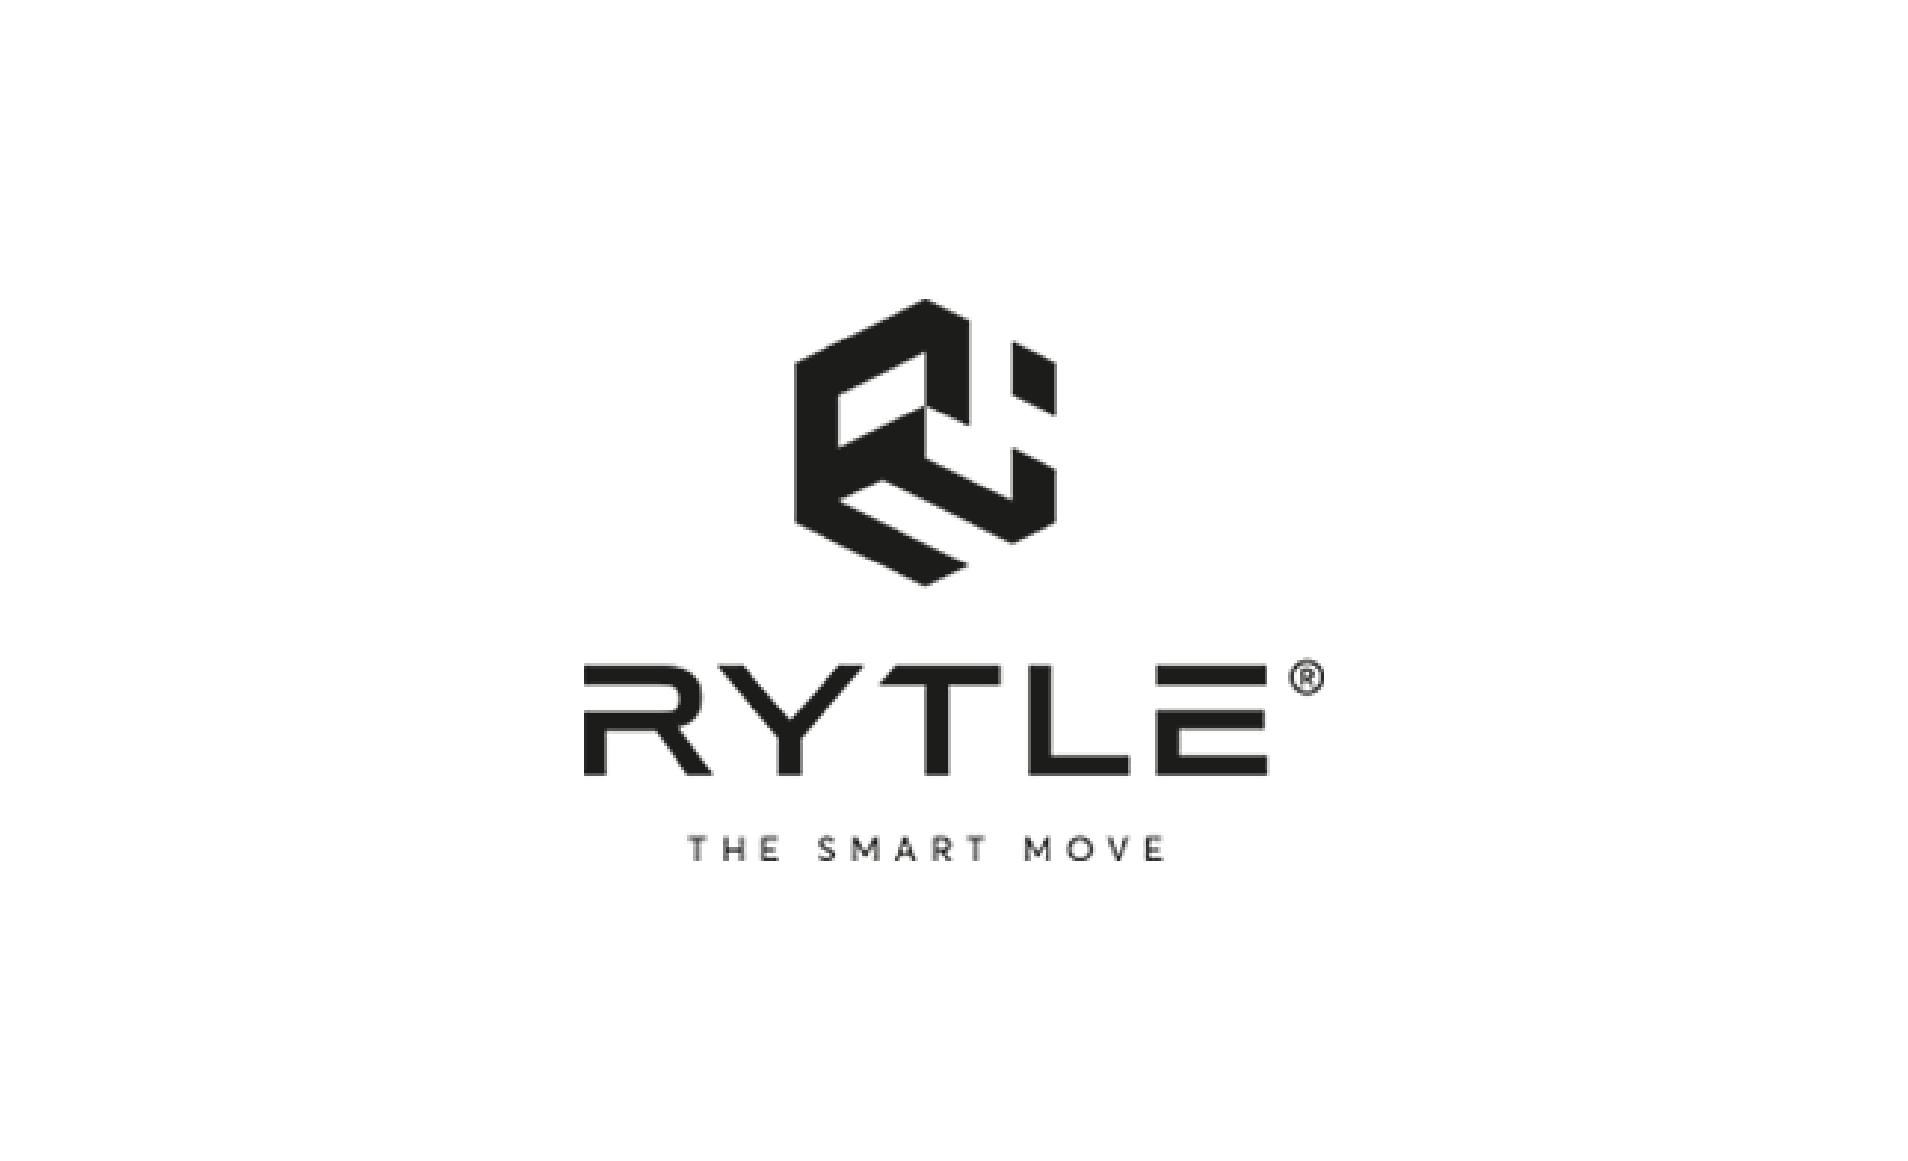 ltt rytle -08.png